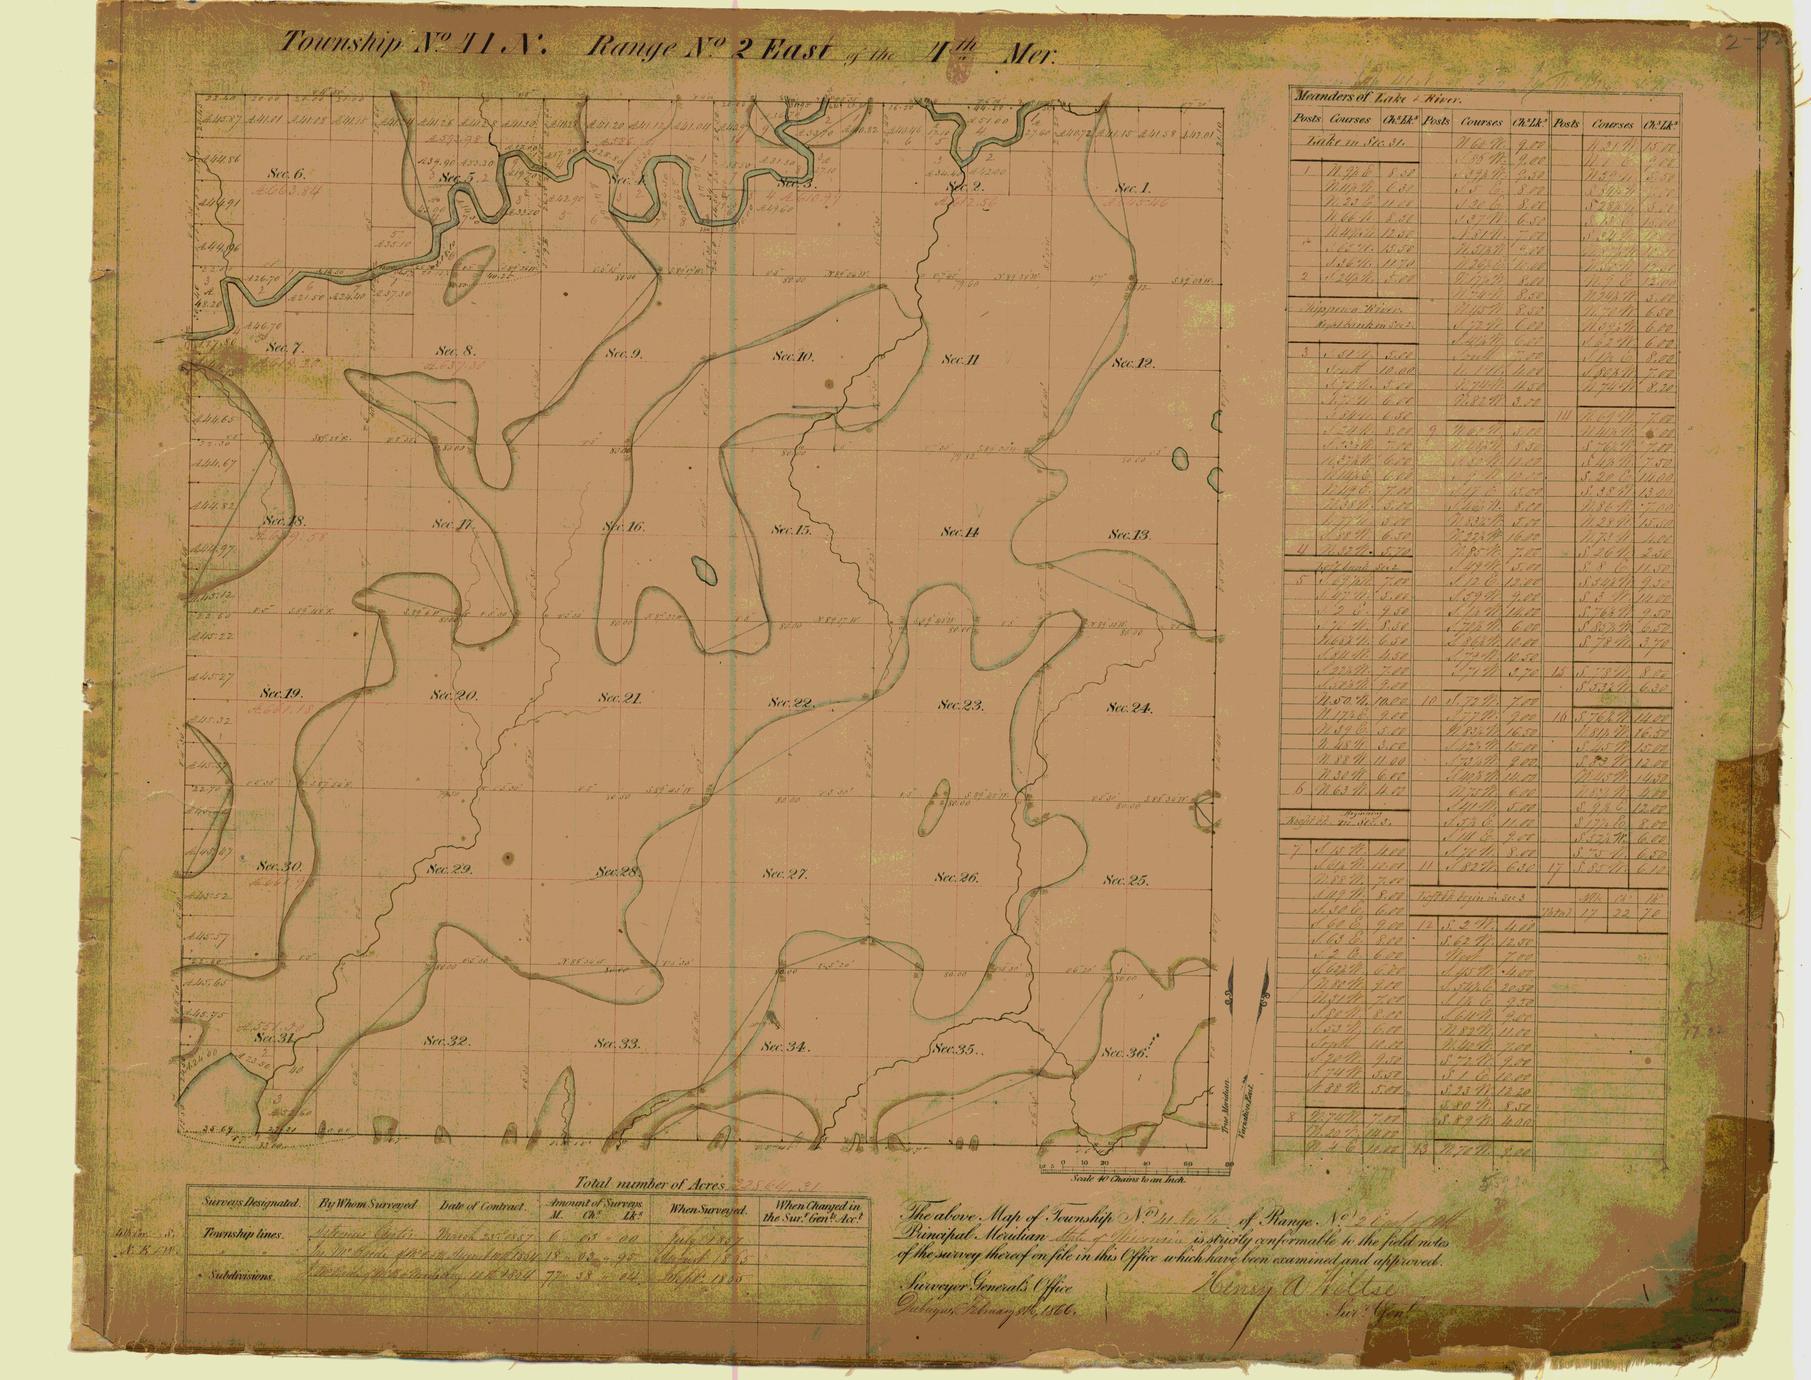 [Public Land Survey System map: Wisconsin Township 41 North, Range 02 East]